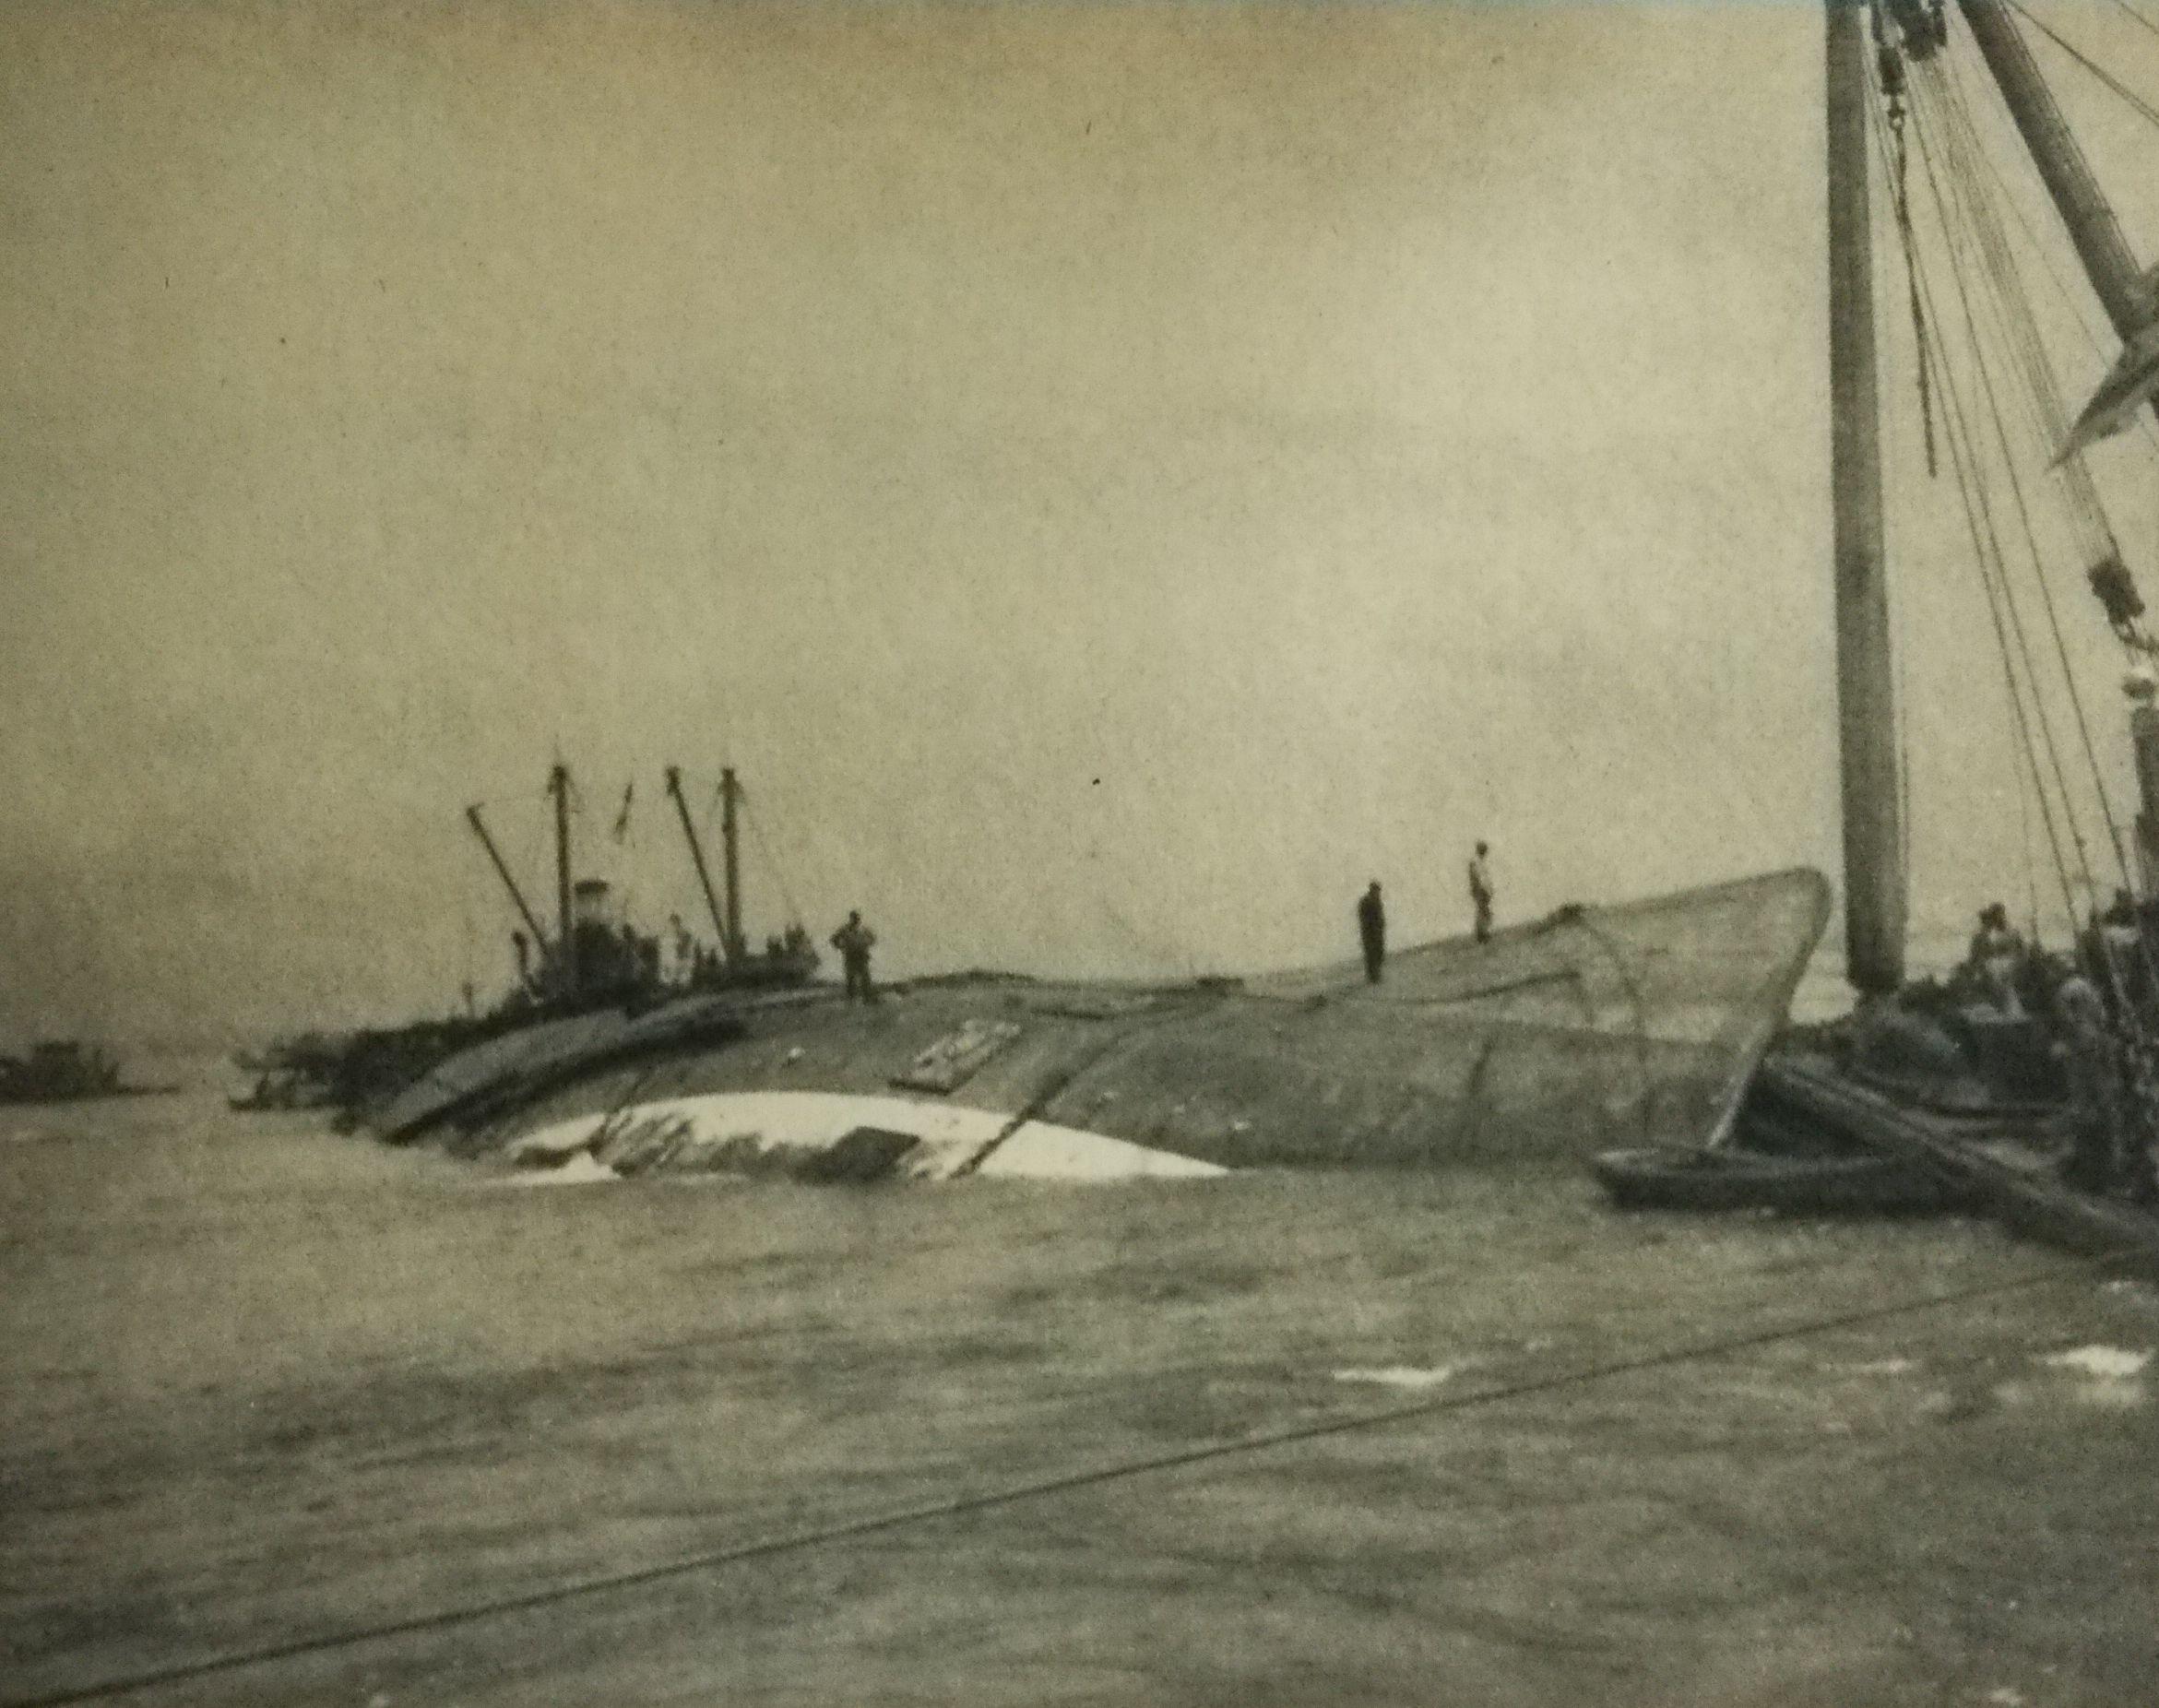 Toya-maru 1955